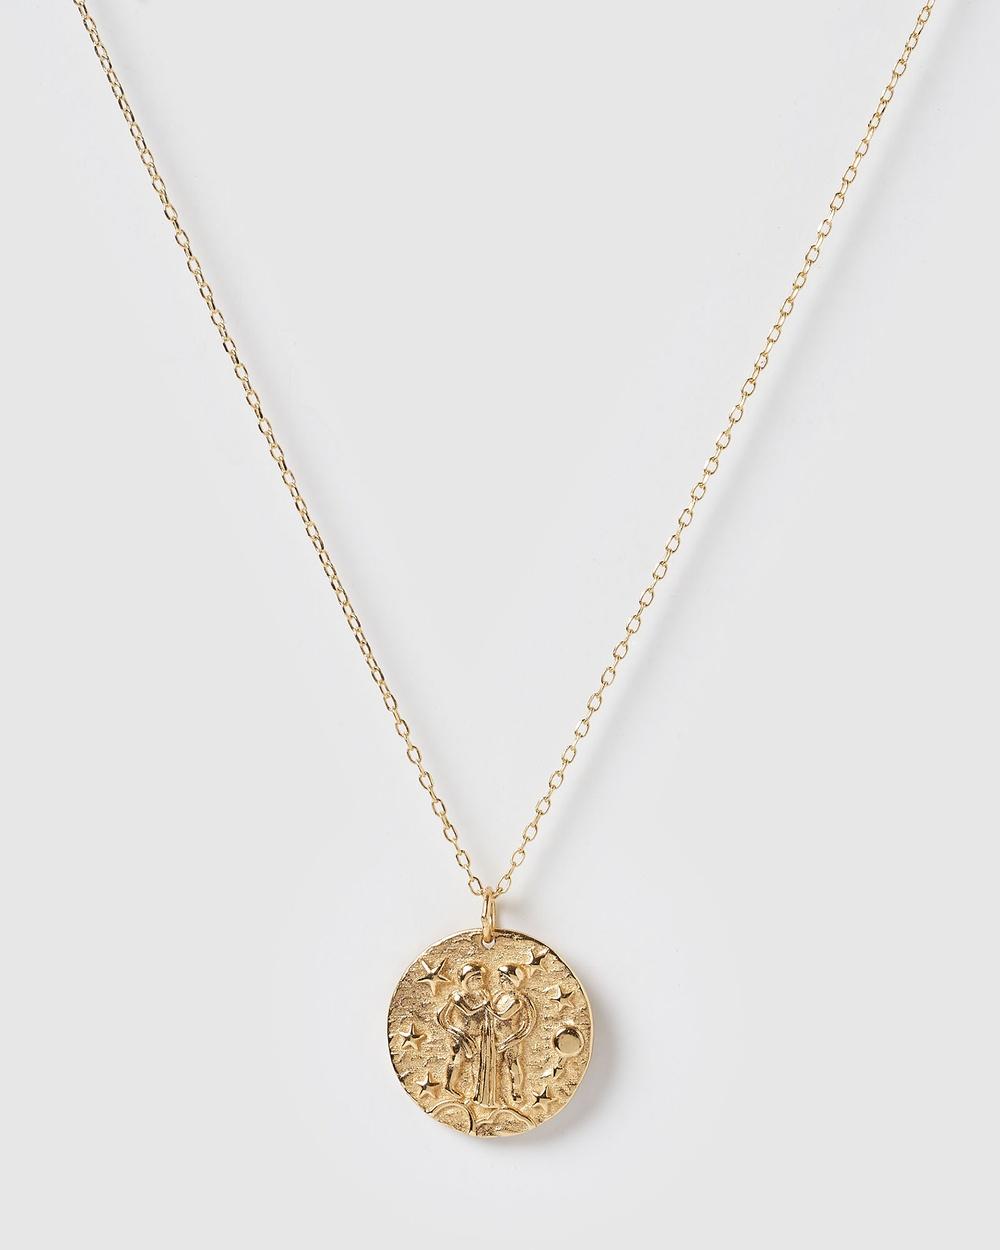 Izoa Star Sign Necklace Gemini Jewellery Gold